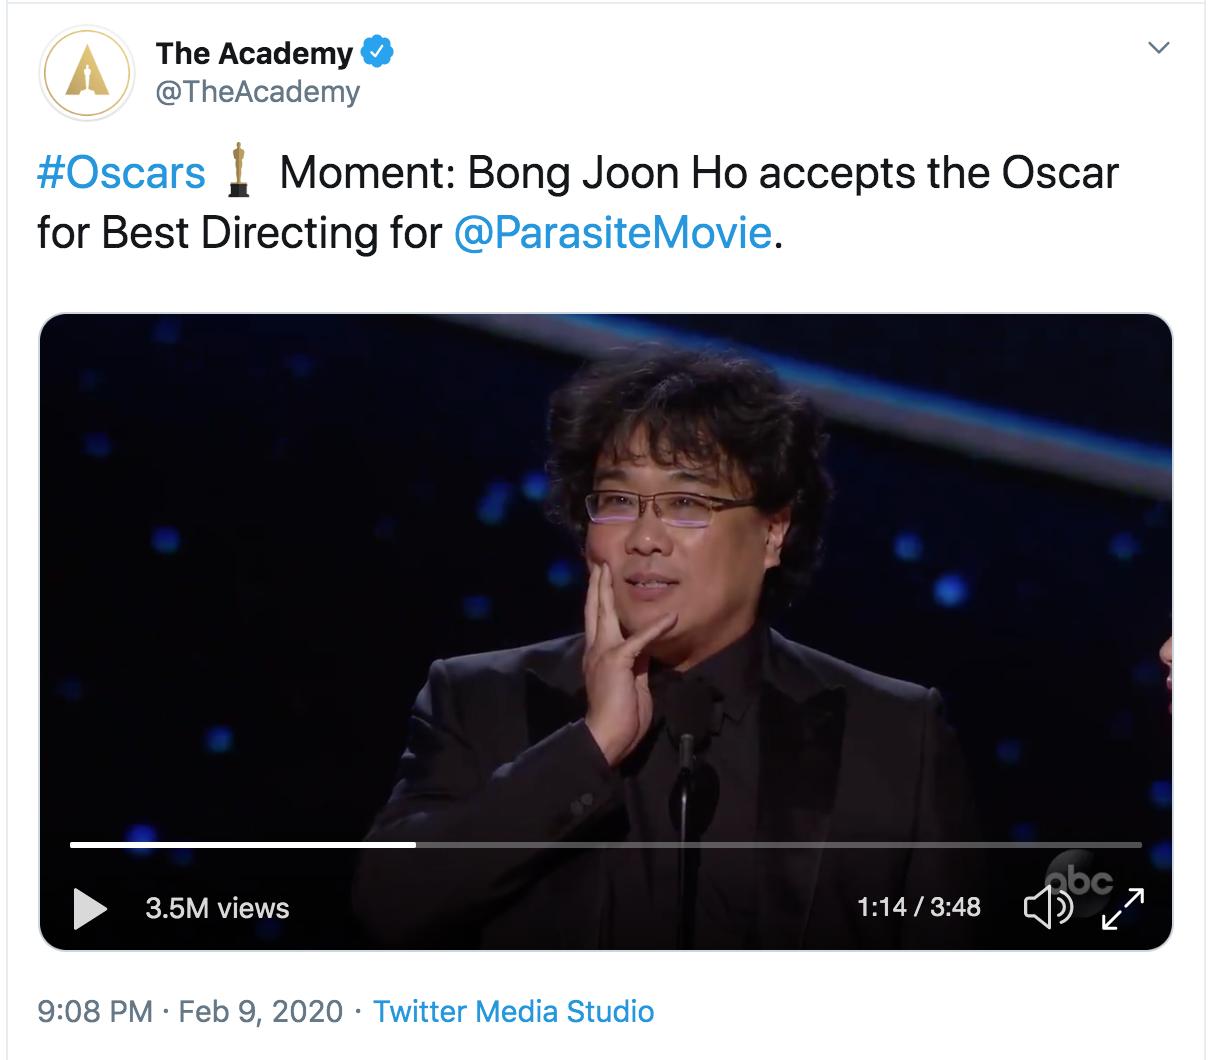 #Oscars Moment: Bong Joon Ho accepts the Oscar for Best Directing for @ParasiteMovie .